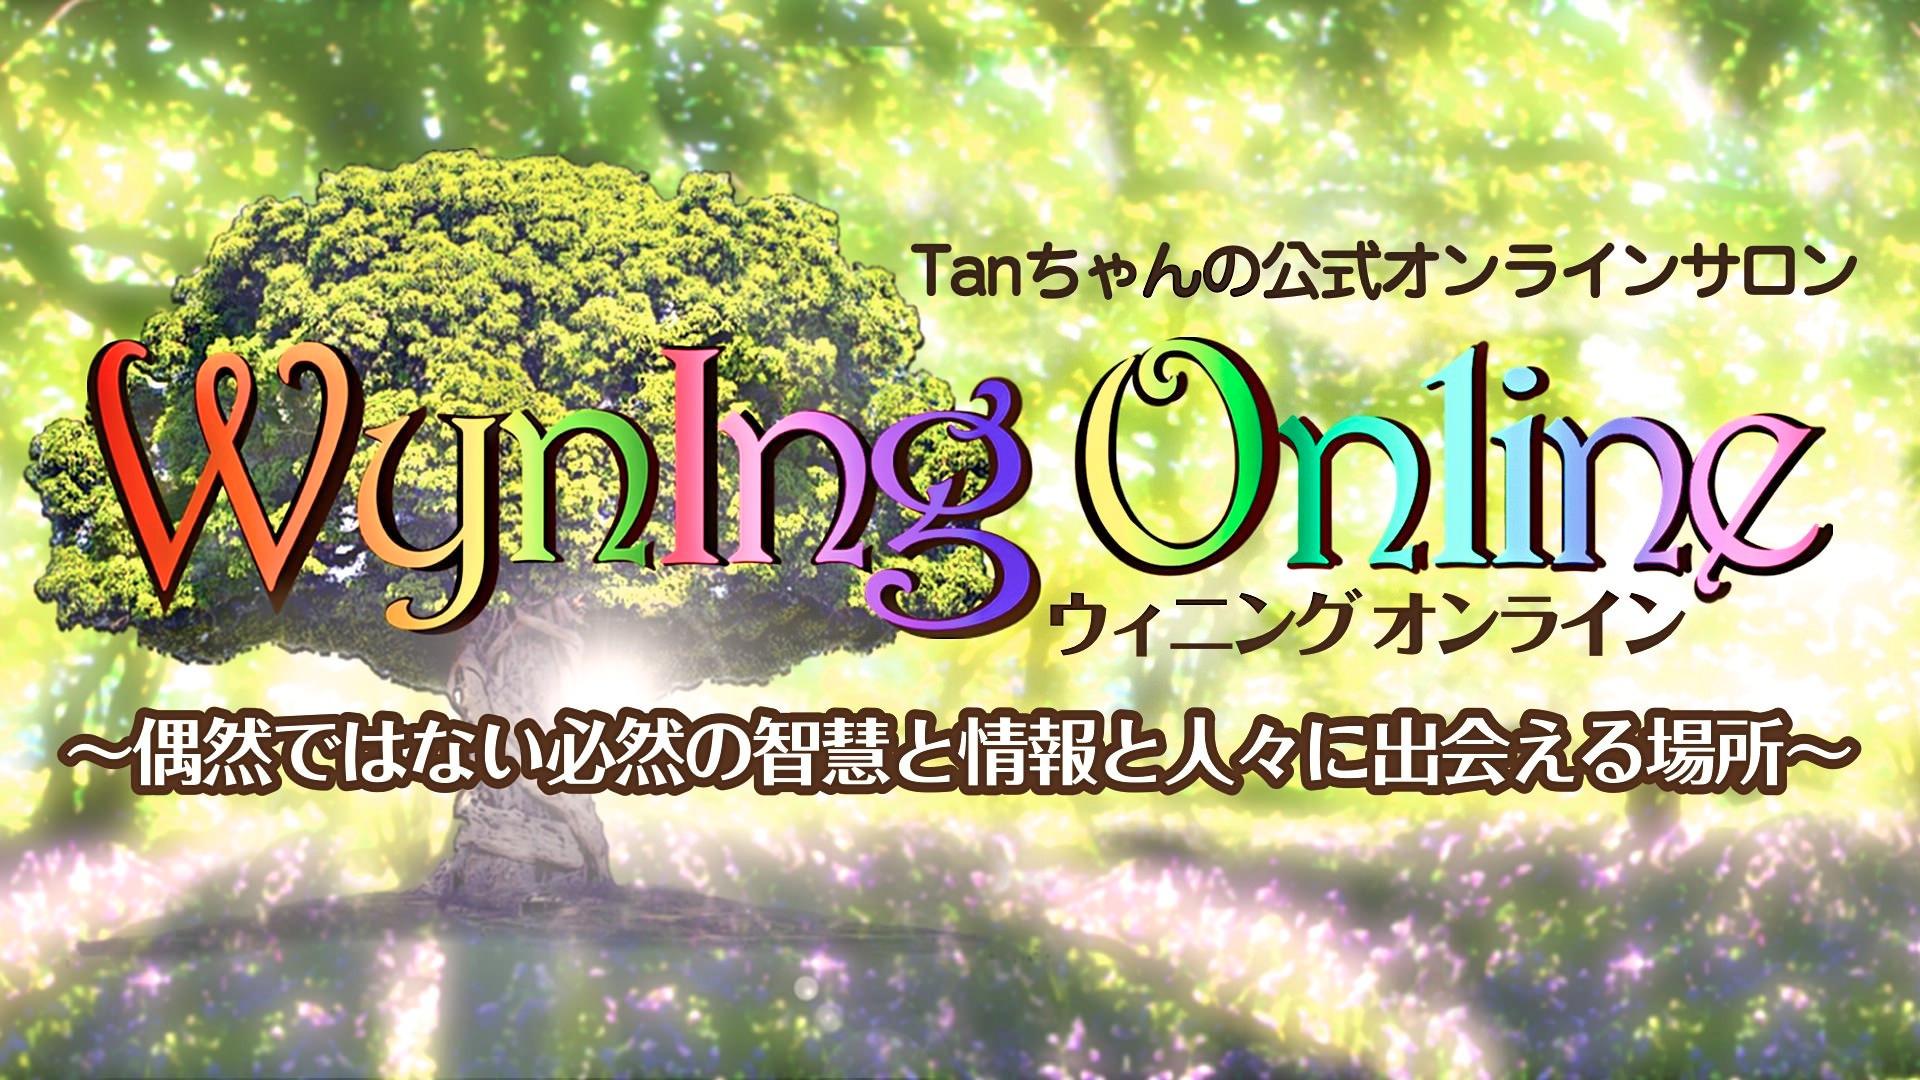 TanちゃんのWynIng Online(ウィニングオンライン)